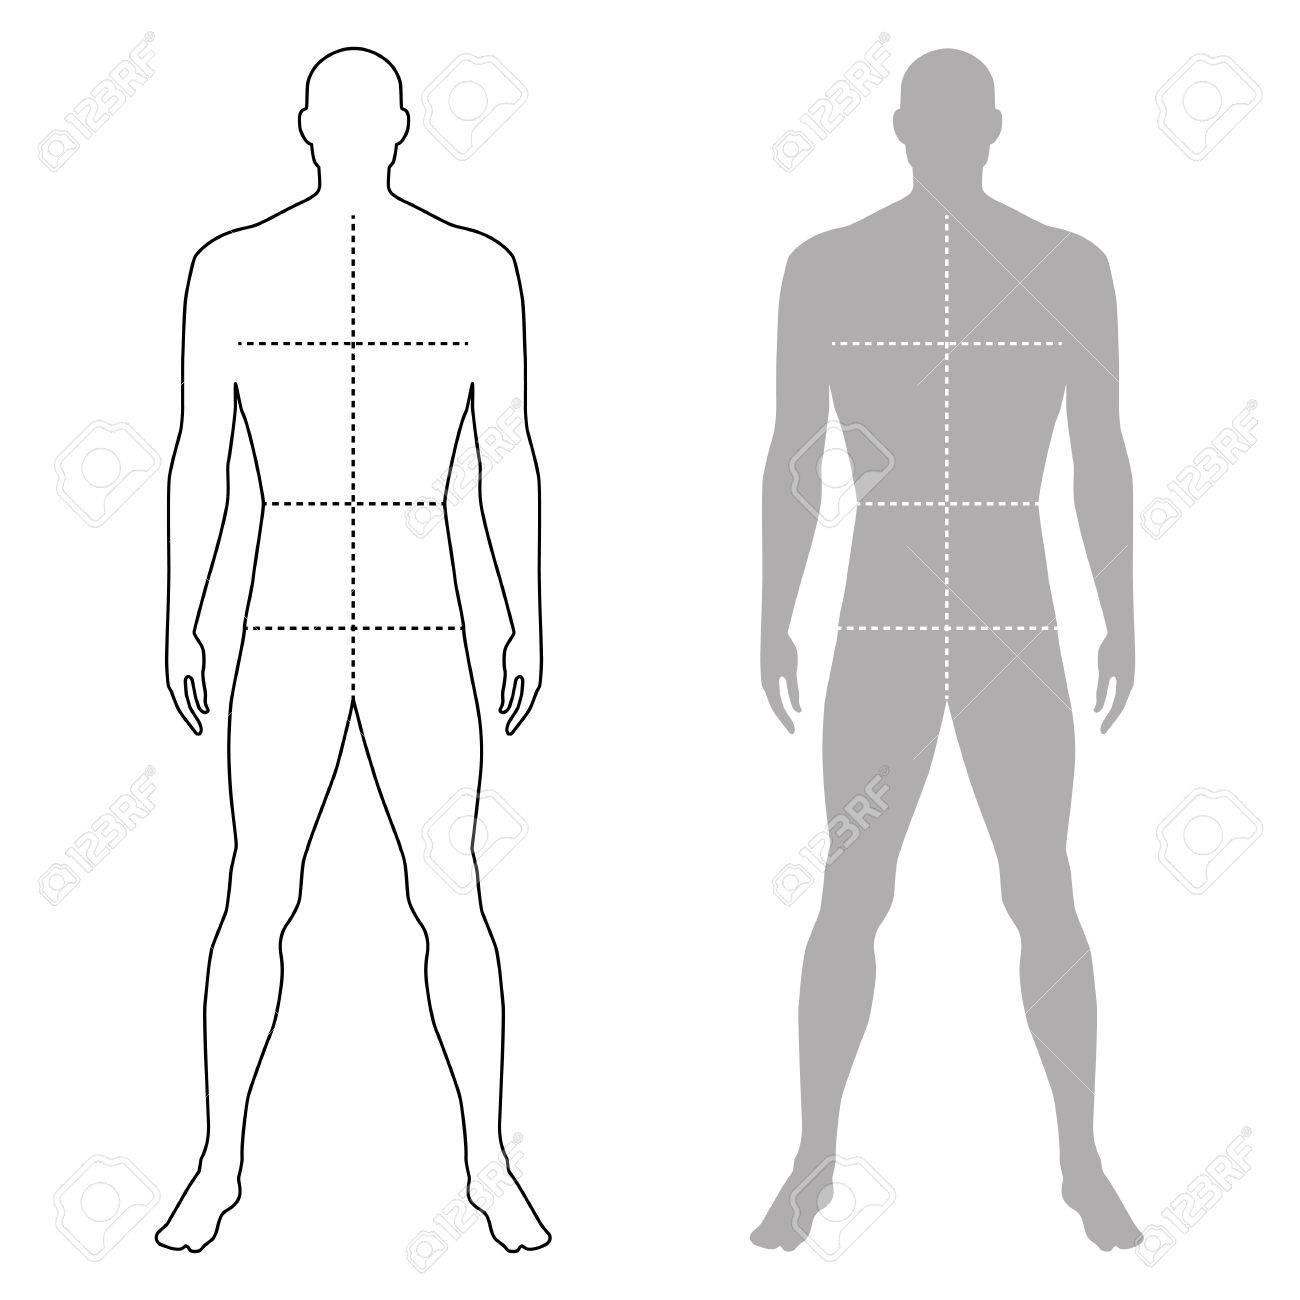 Erfreut Modedesign Körper Vorlagen Bilder - Entry Level Resume ...